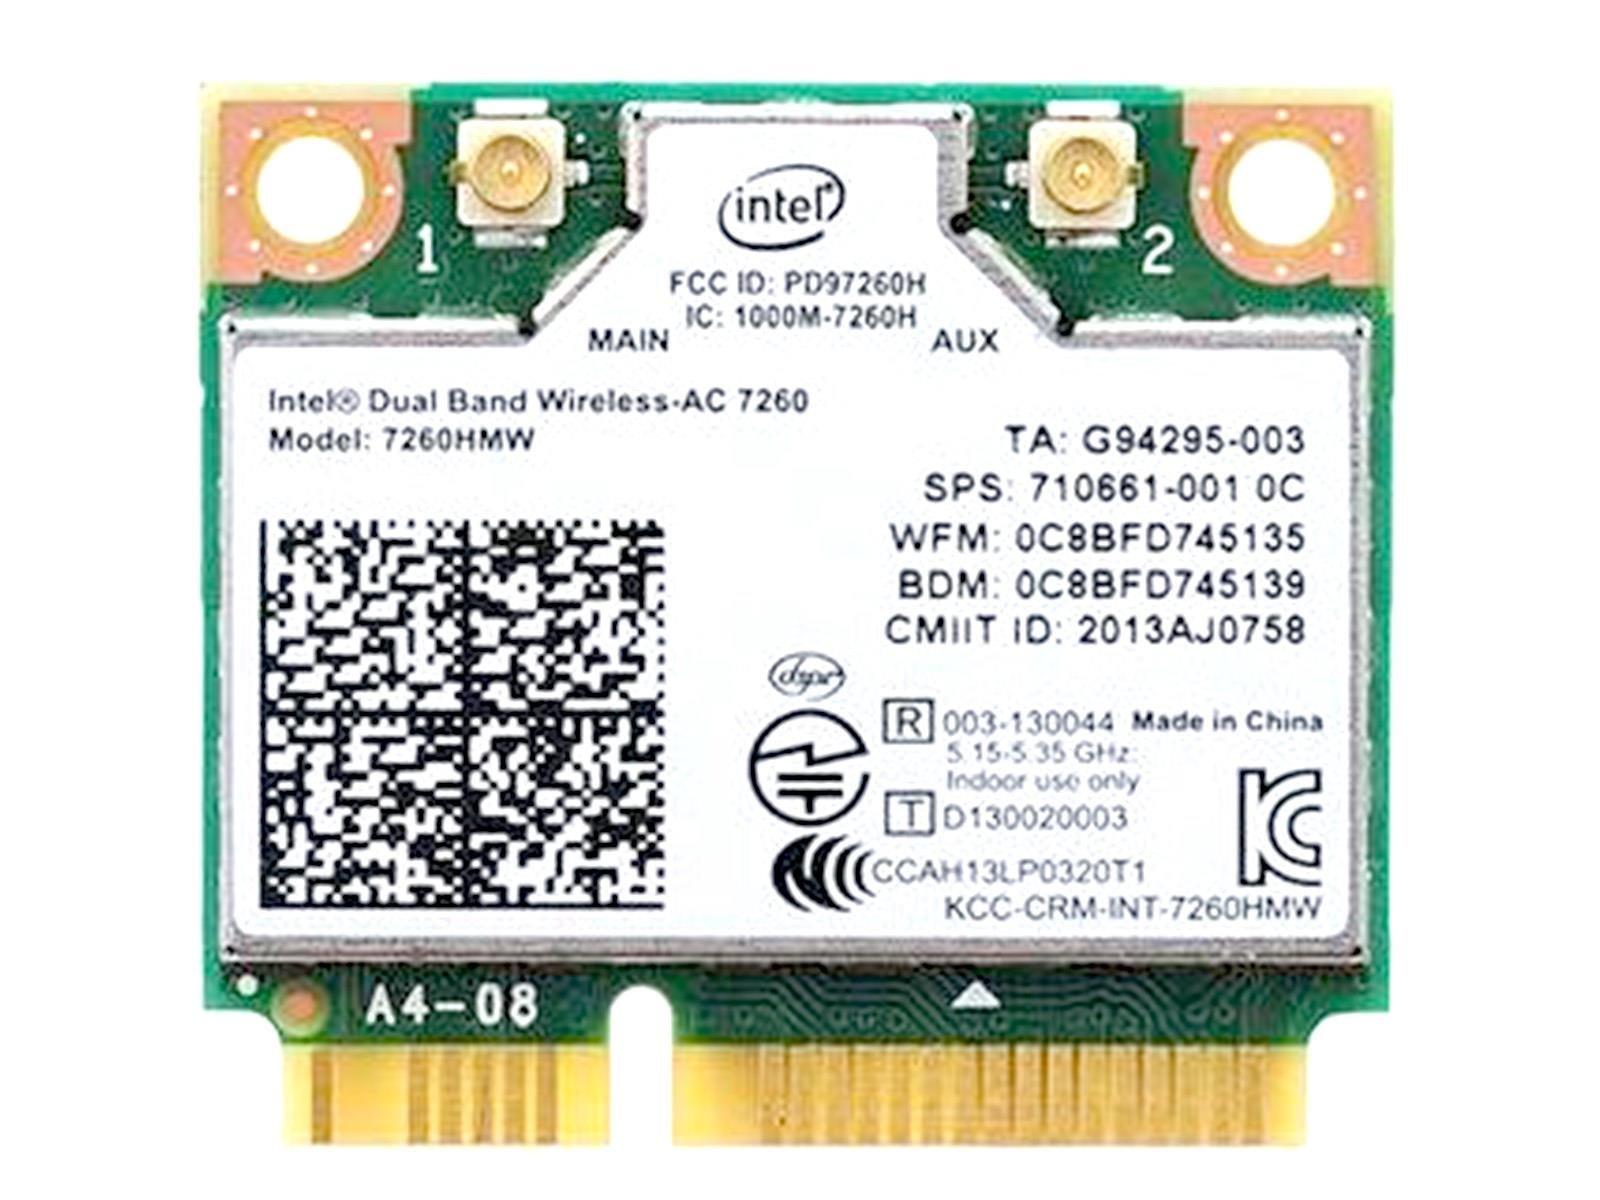 intel Dual Band Wireless-AC 7260 7260HMW Half Mini PCIe PCI-express WLAN WIFI Card Module 802.11 ac/a/b/g/n 867Mbps BlueTooth BT